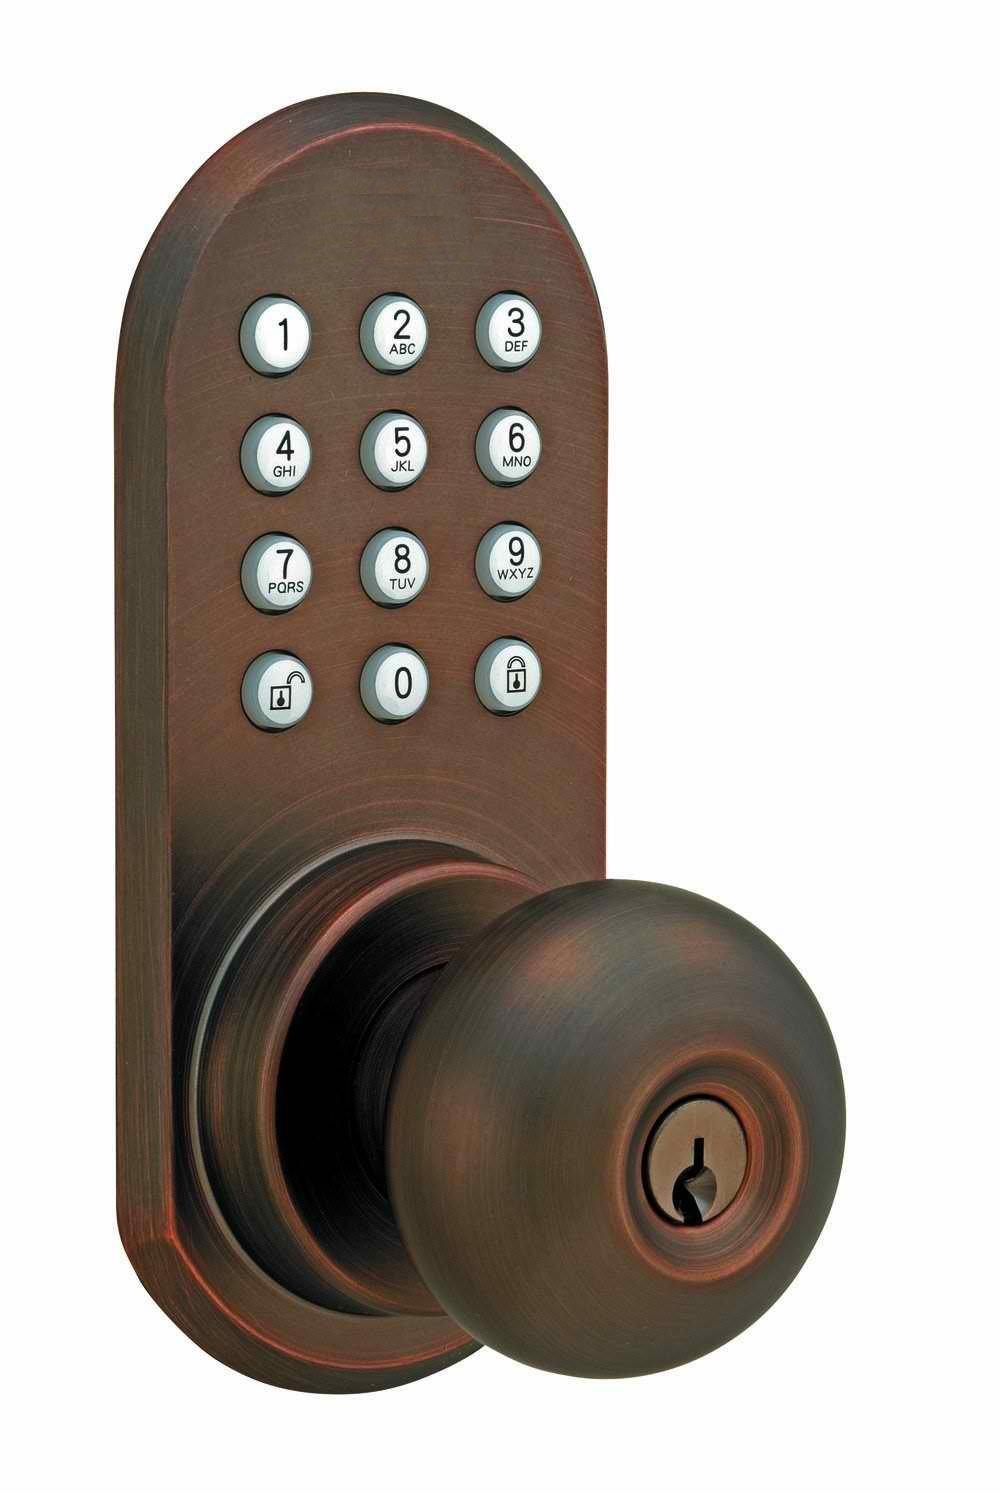 Remote Door Locks ShowCase